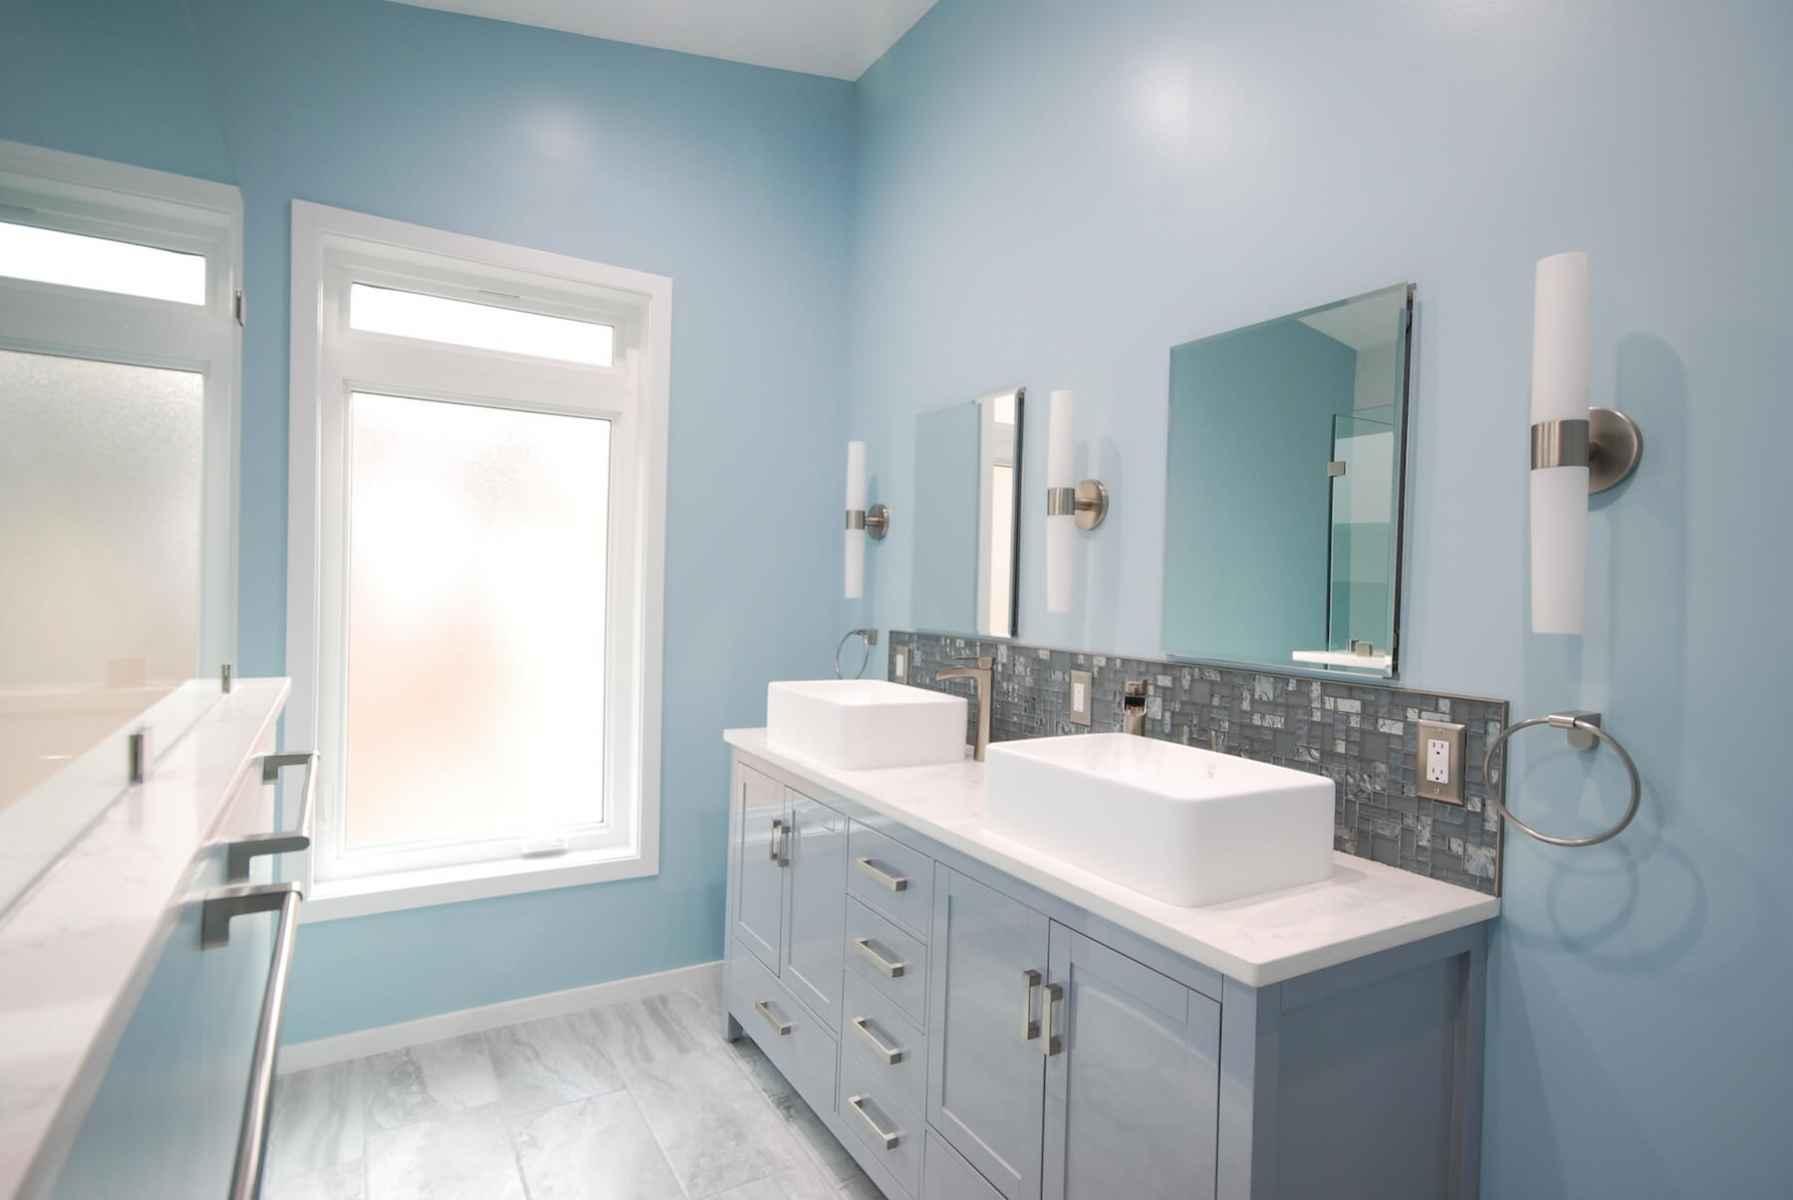 bathroomadd_8514-1-2-1